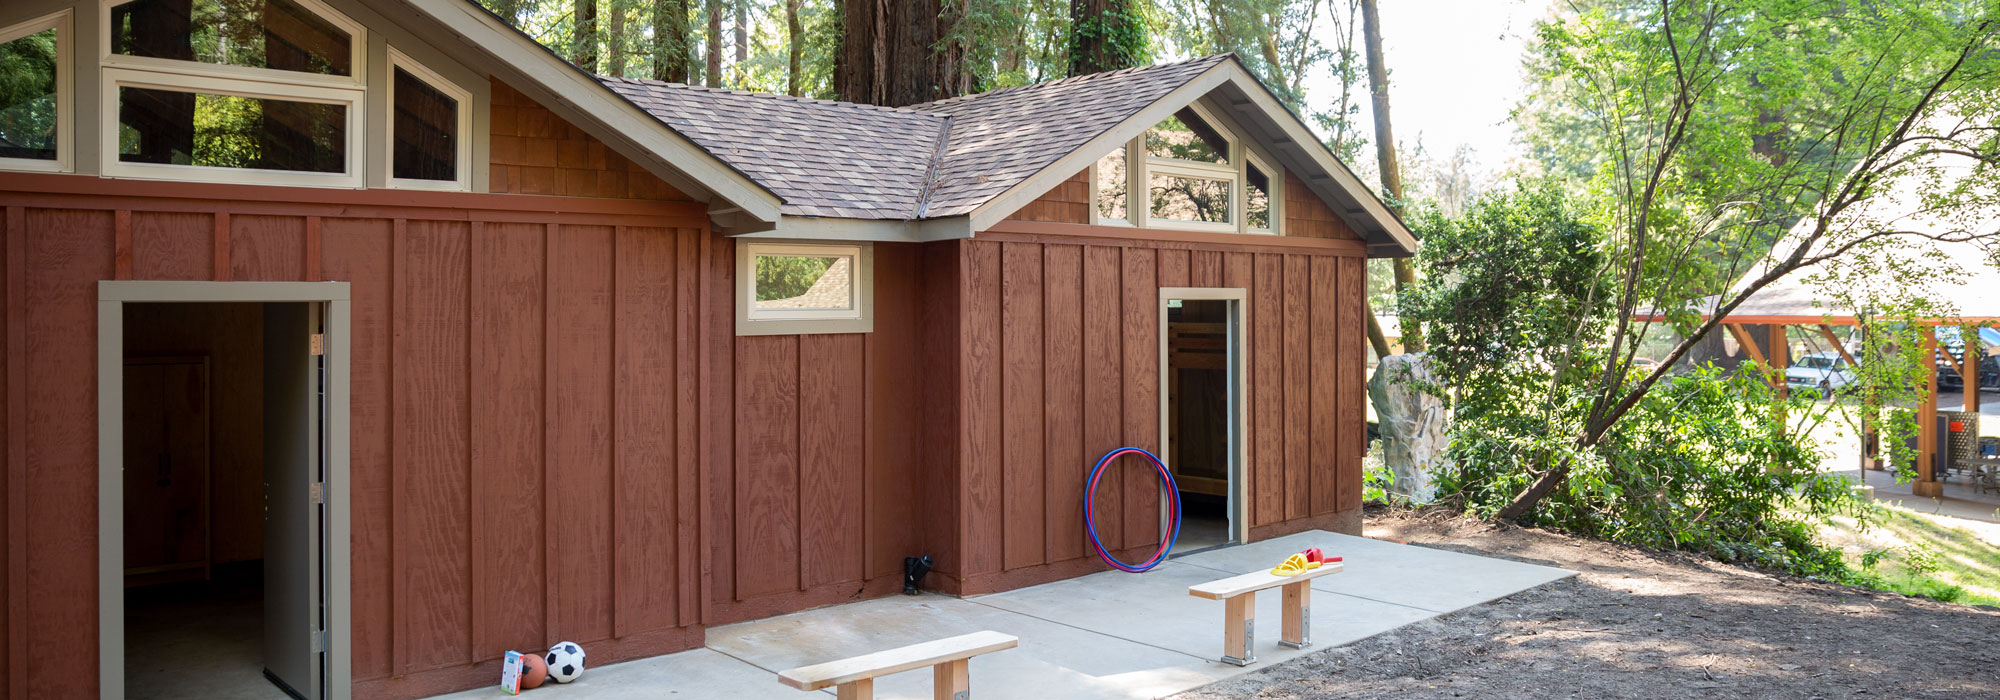 New Redwood Cabin